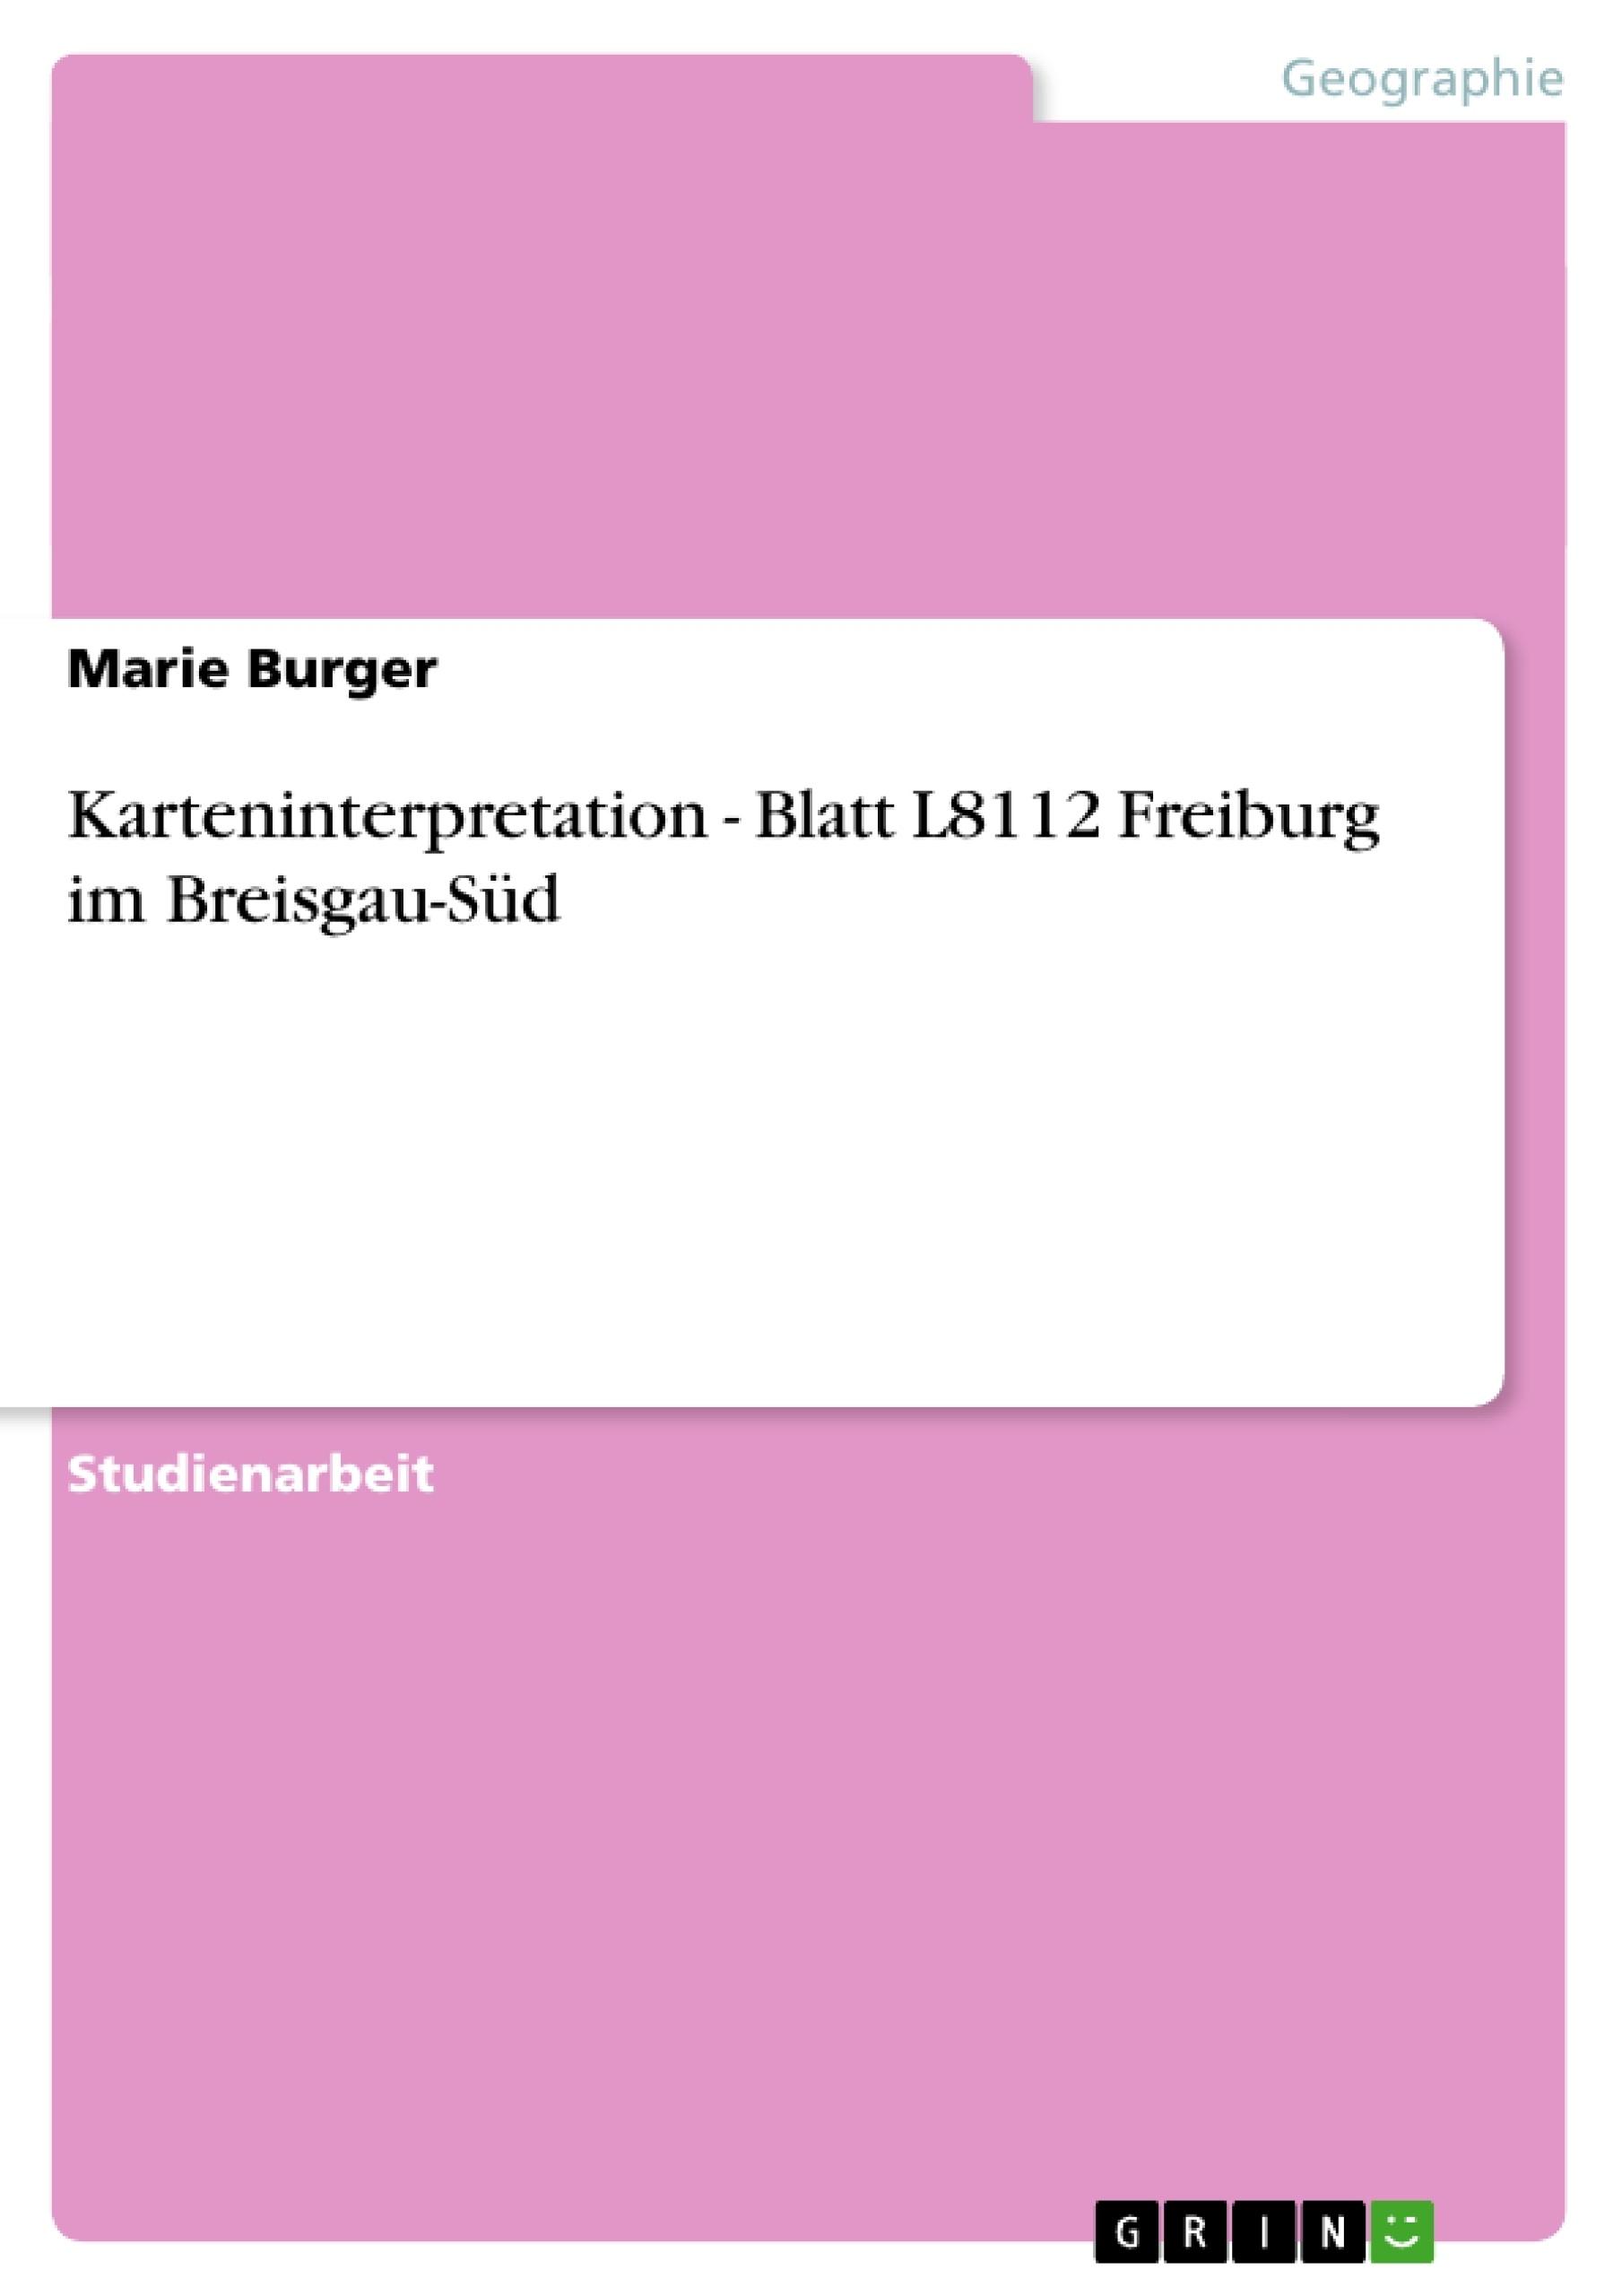 Titel: Karteninterpretation - Blatt L8112 Freiburg im Breisgau-Süd